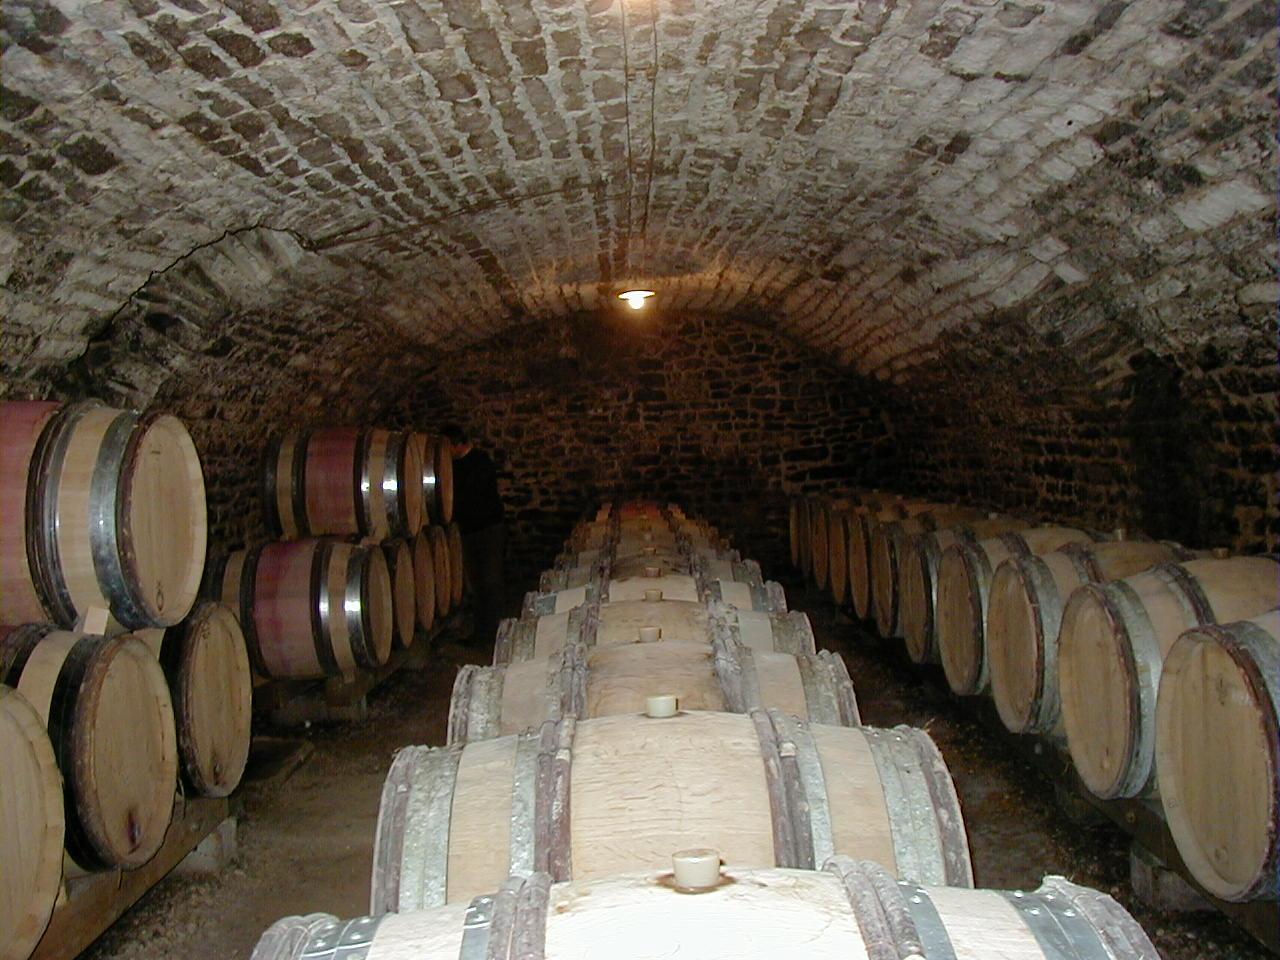 The Jaeger-Defaix wine cellar